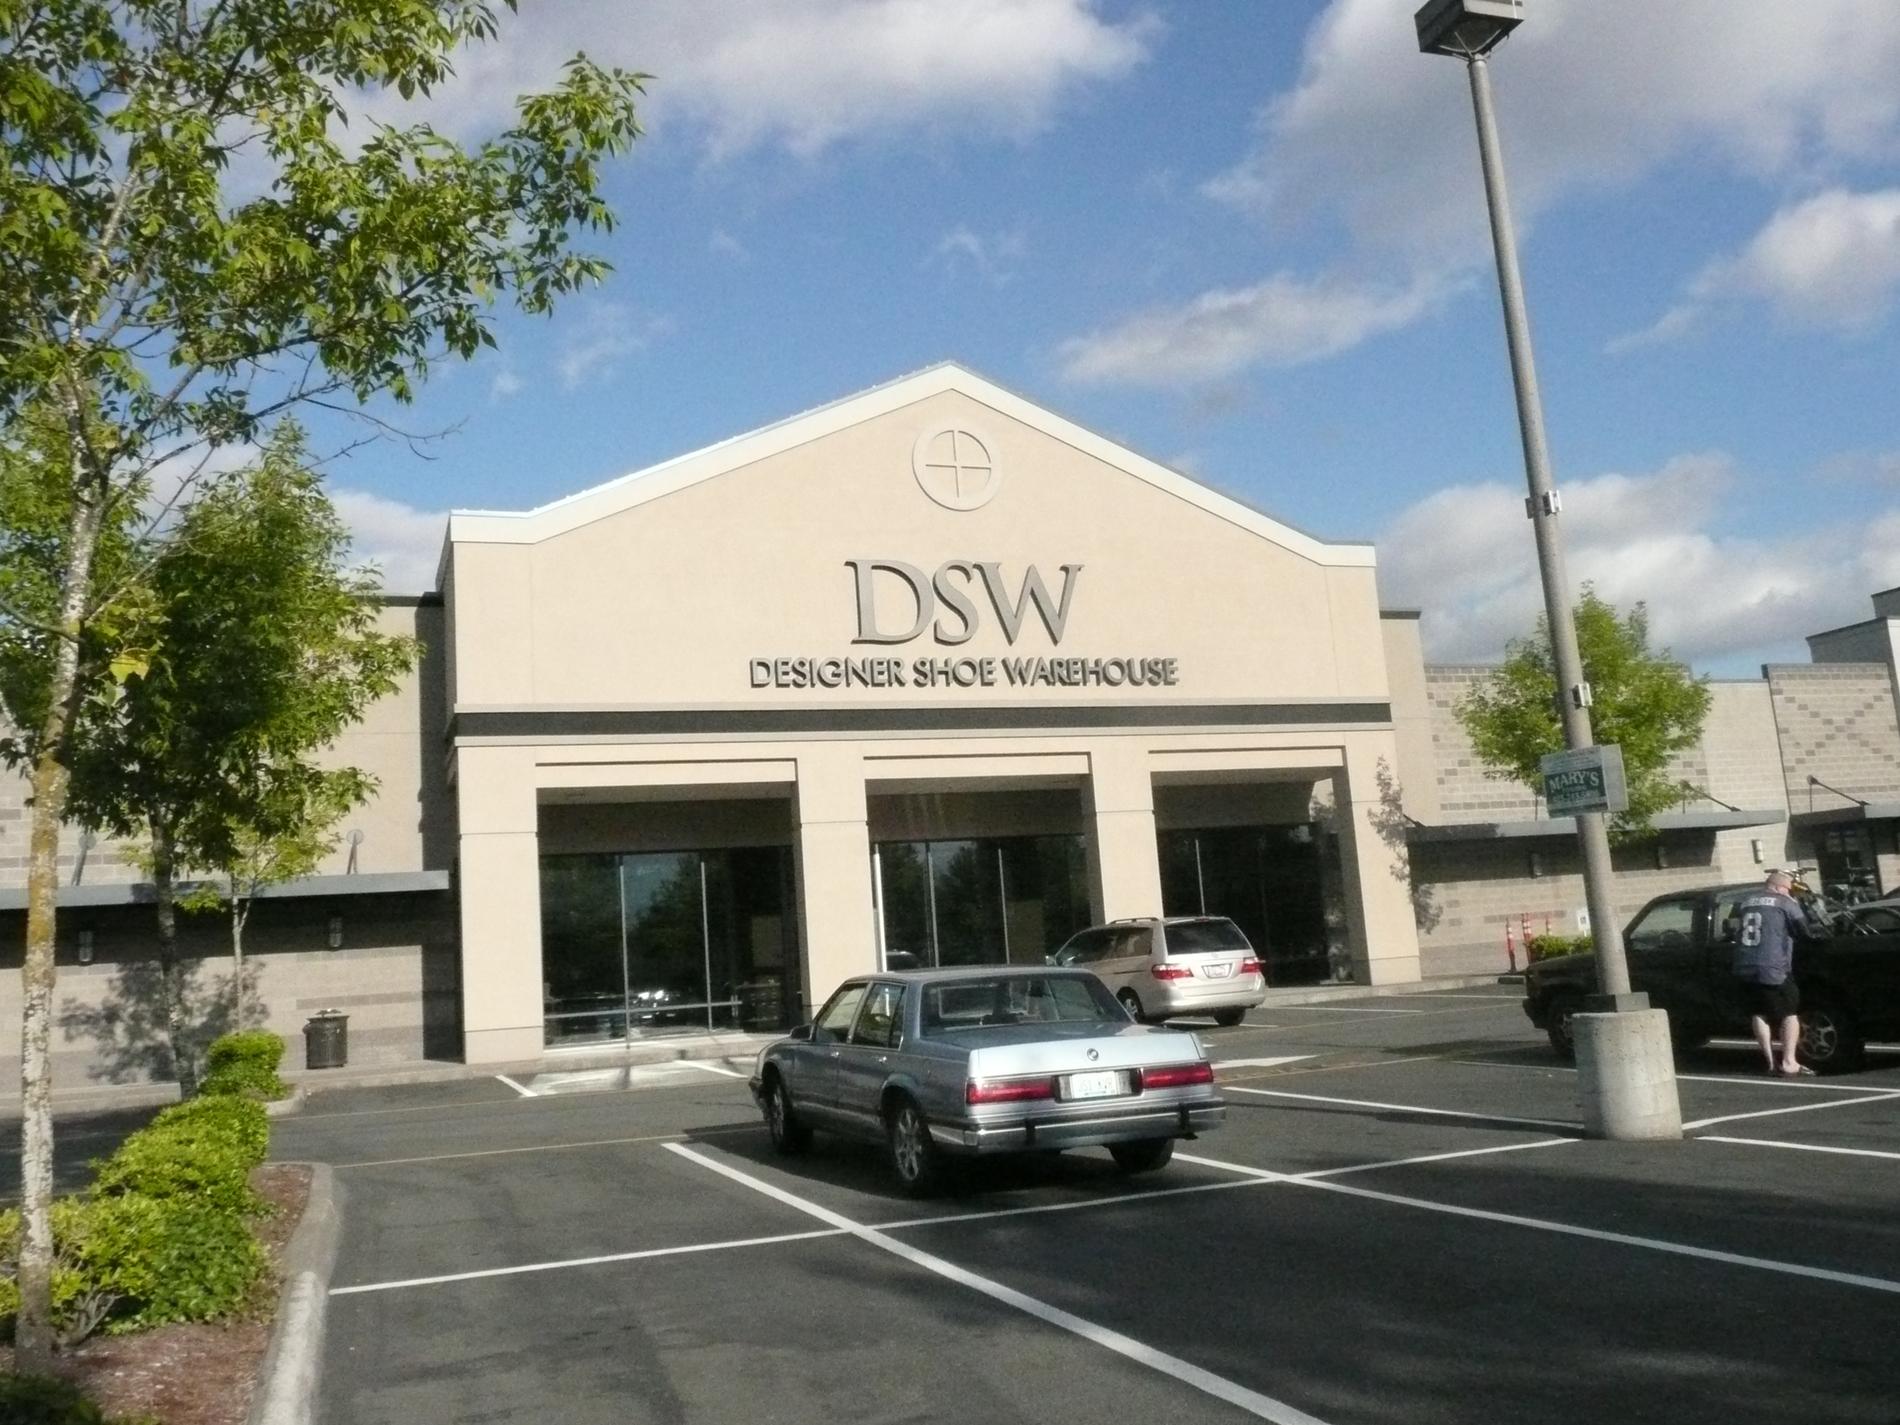 dsw women 39 s and men 39 s shoe store in lynnwood wa. Black Bedroom Furniture Sets. Home Design Ideas